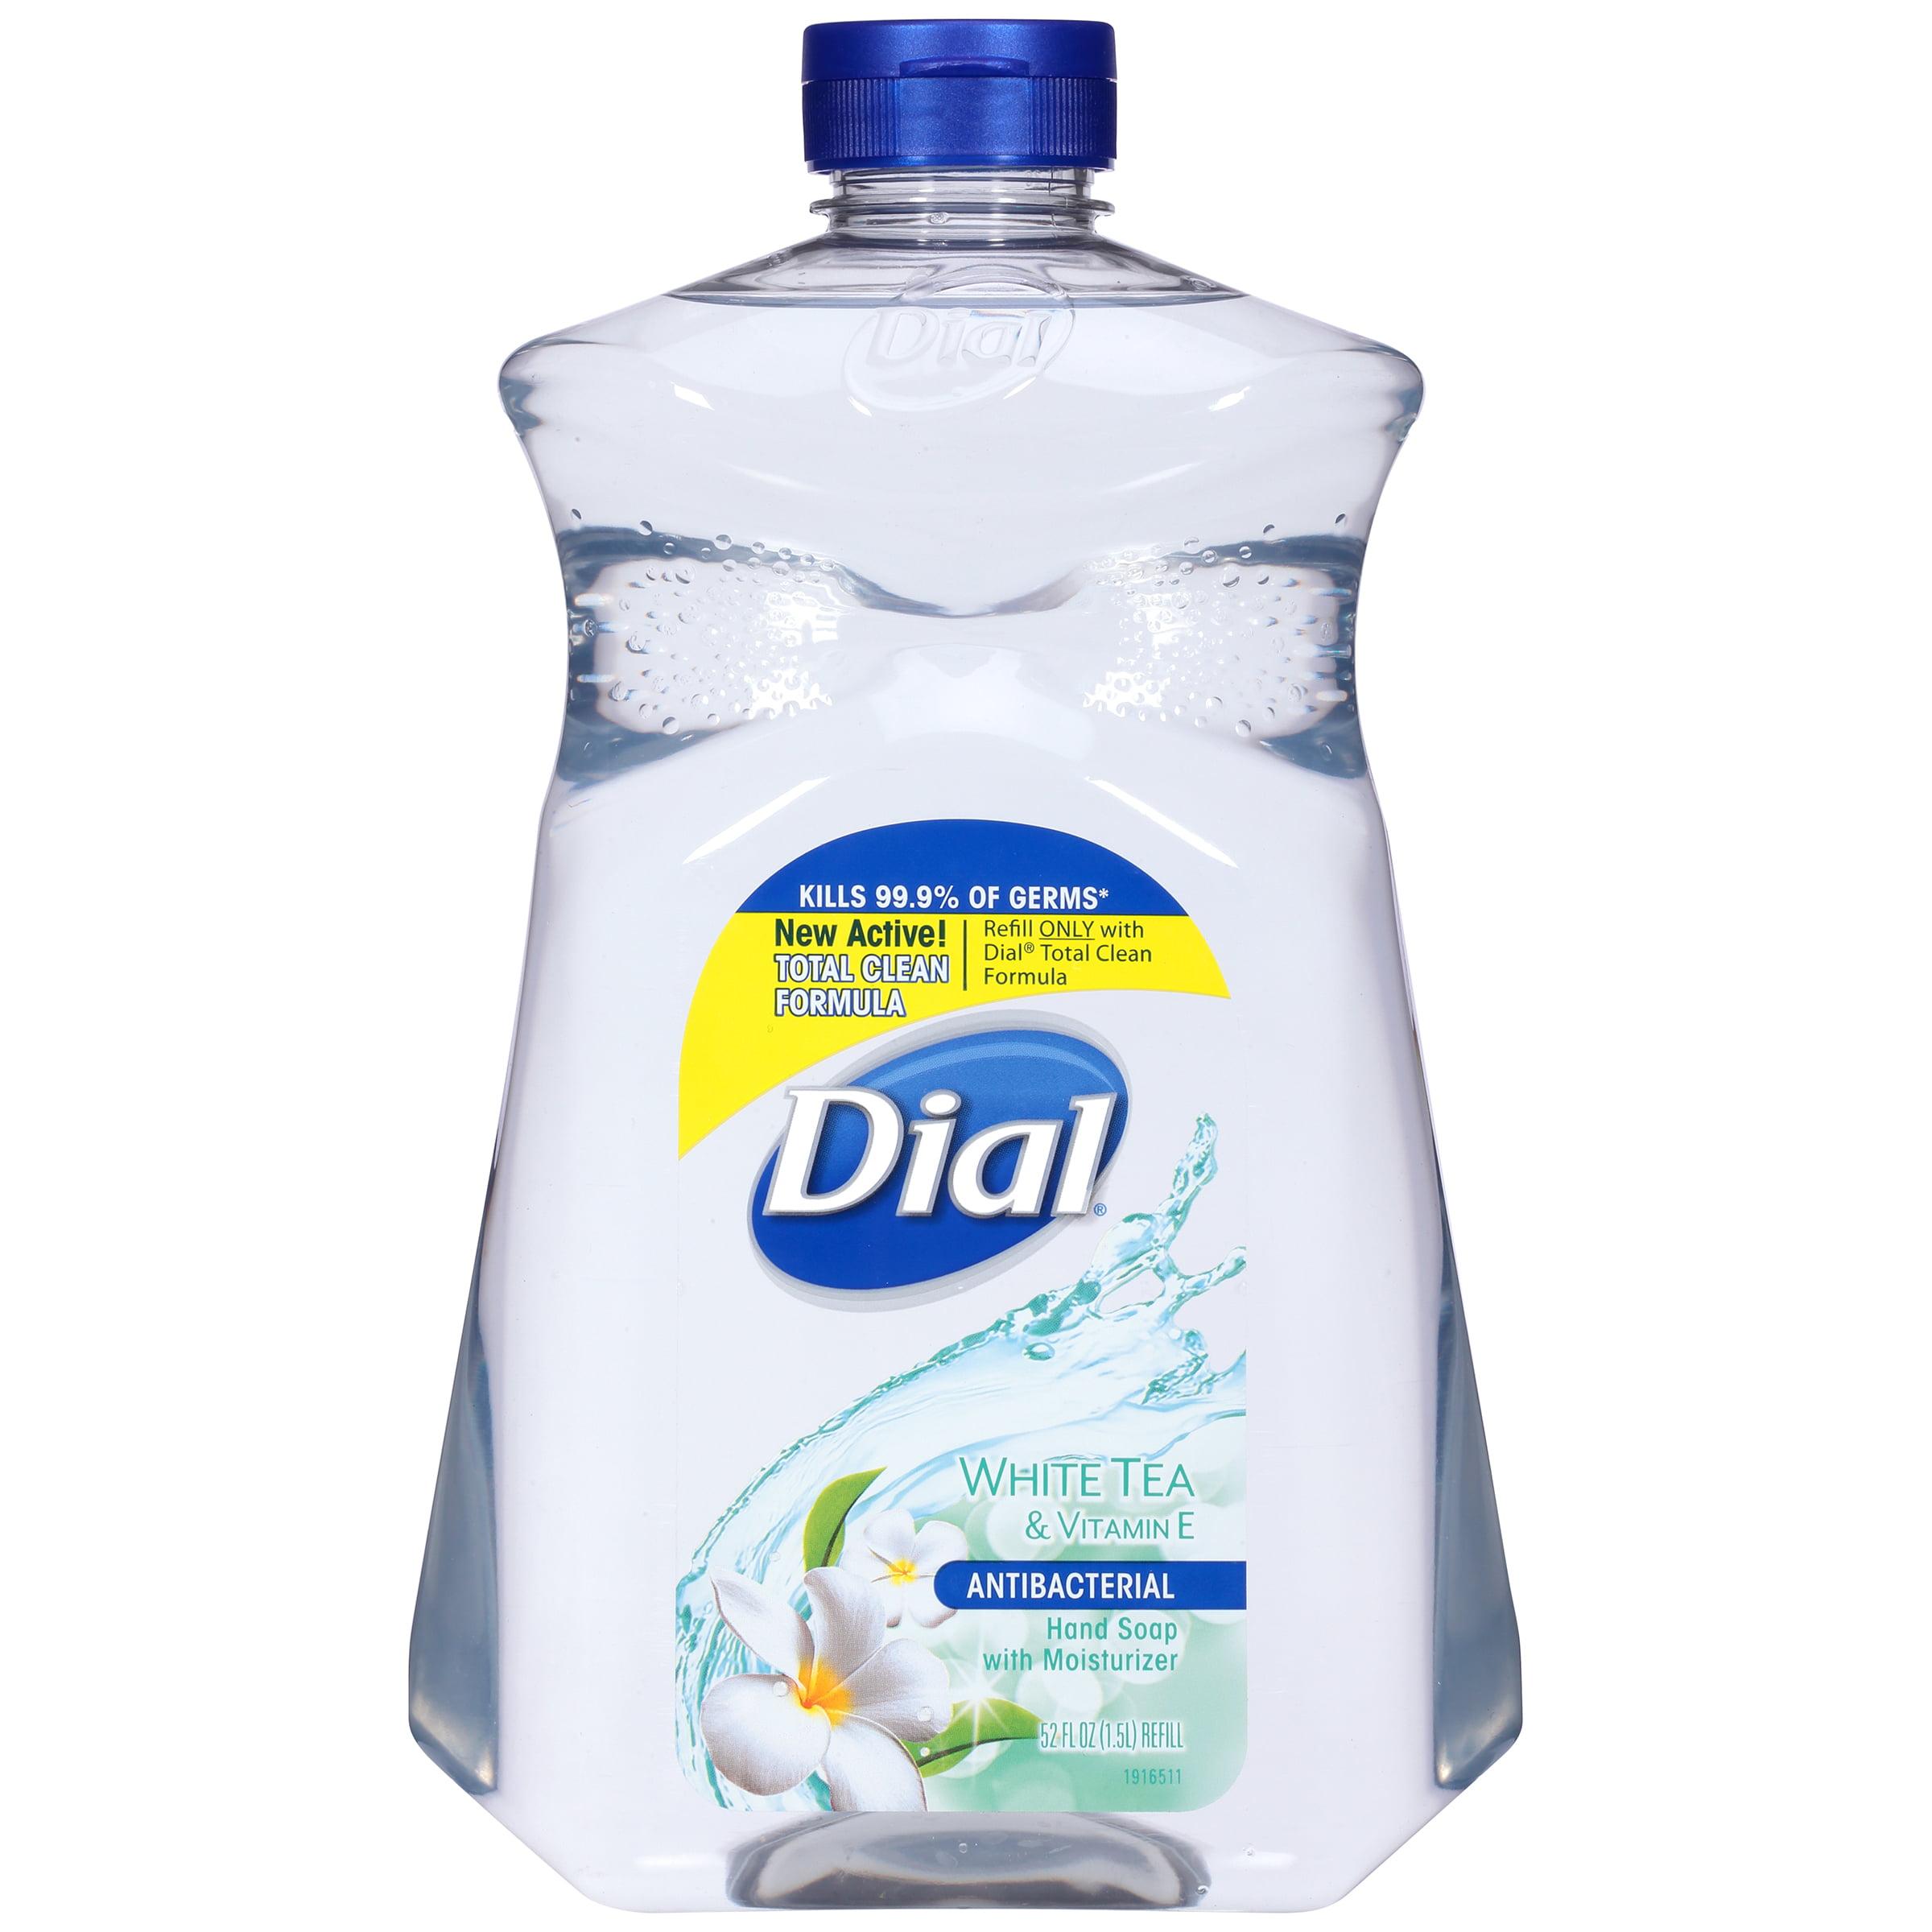 Dial Antibacterial Liquid Hand Soap with Moisturizer Refill, White Tea & Vitamin E, 52 Ounce